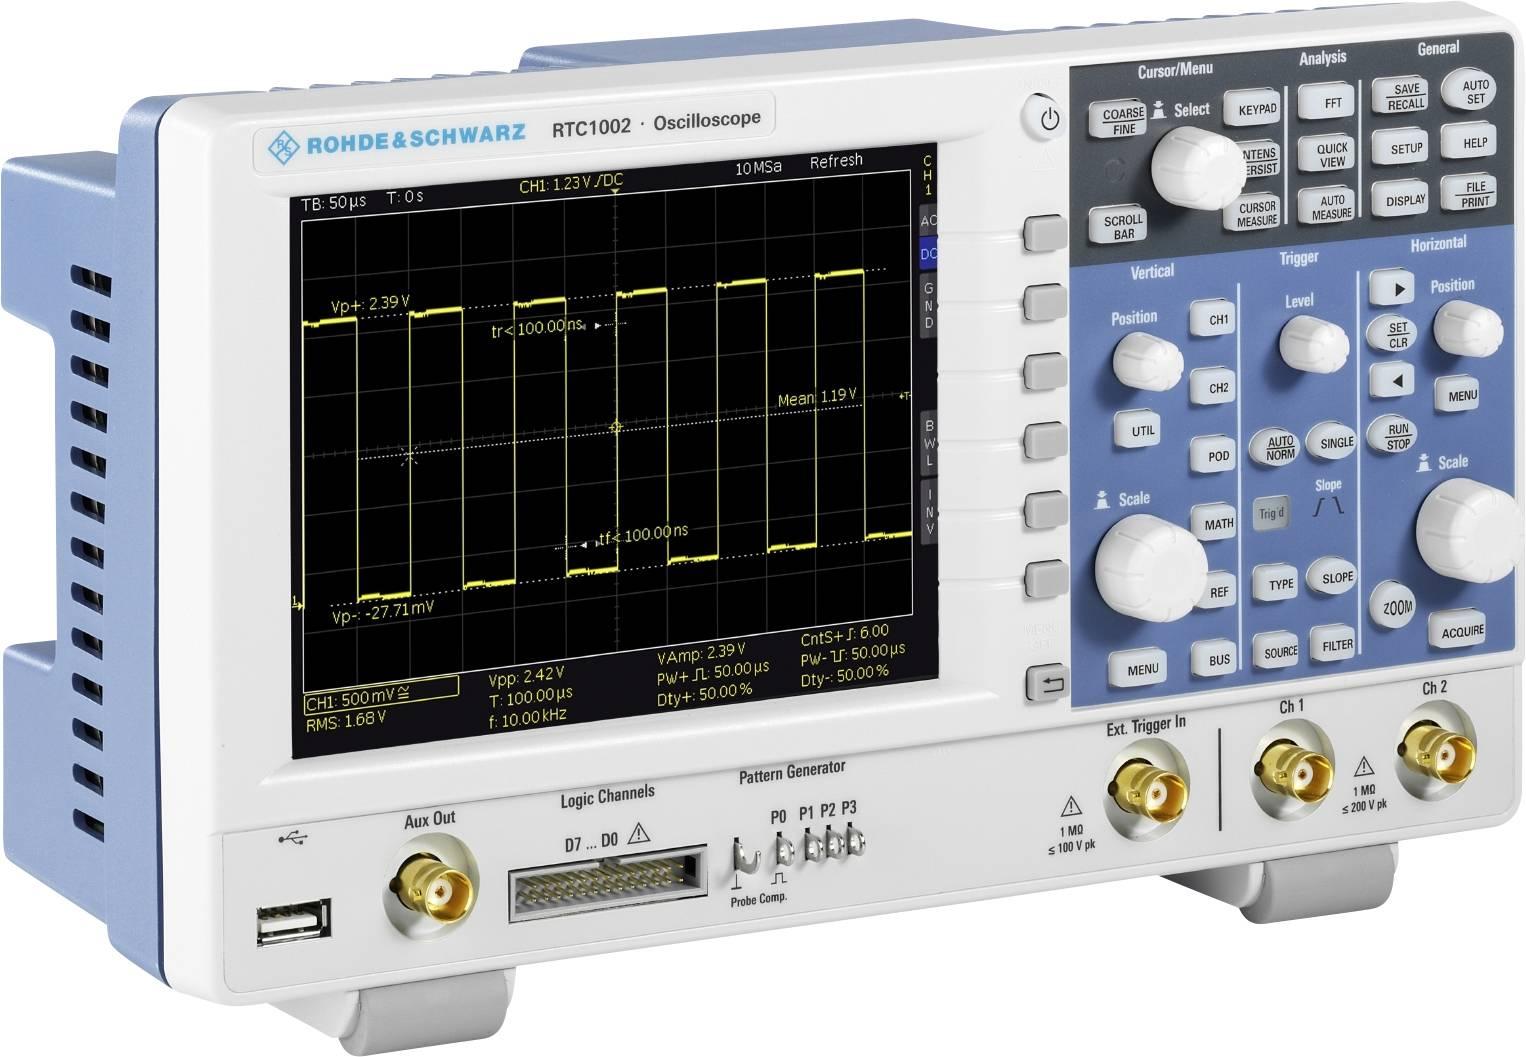 Rohde & Schwarz RTC1002EDU Digital-Oszilloskop 50 MHz 2-Kanal